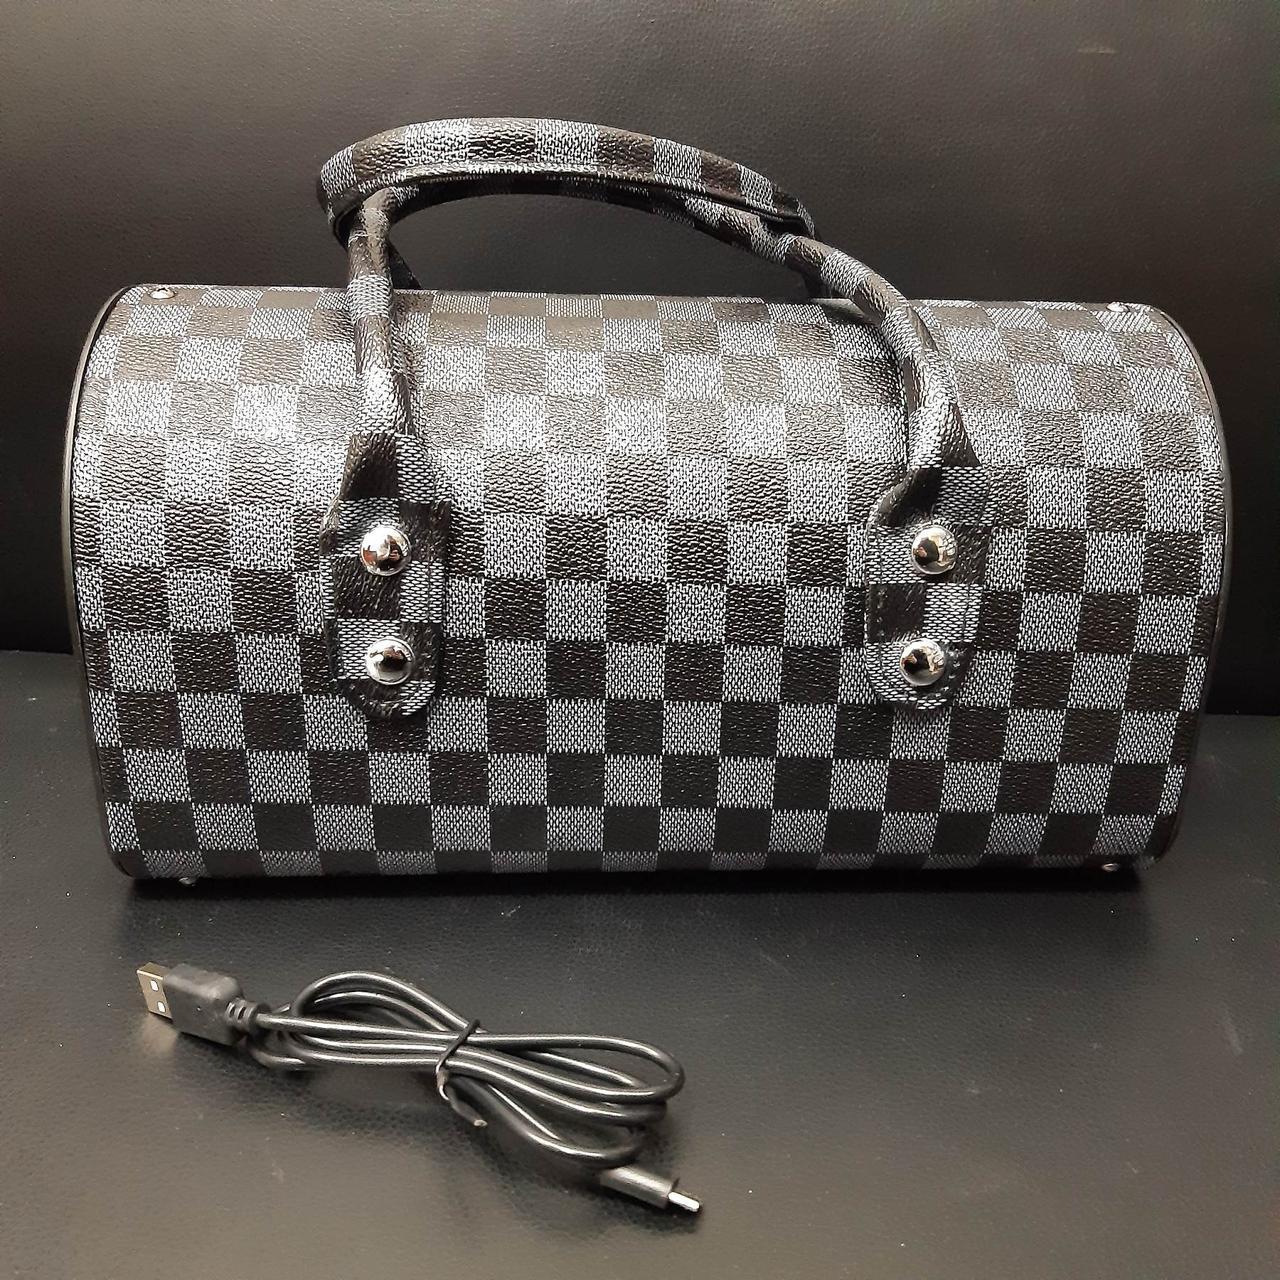 Колонка Луи Витон (Louis Vuitton) 5 ВТ